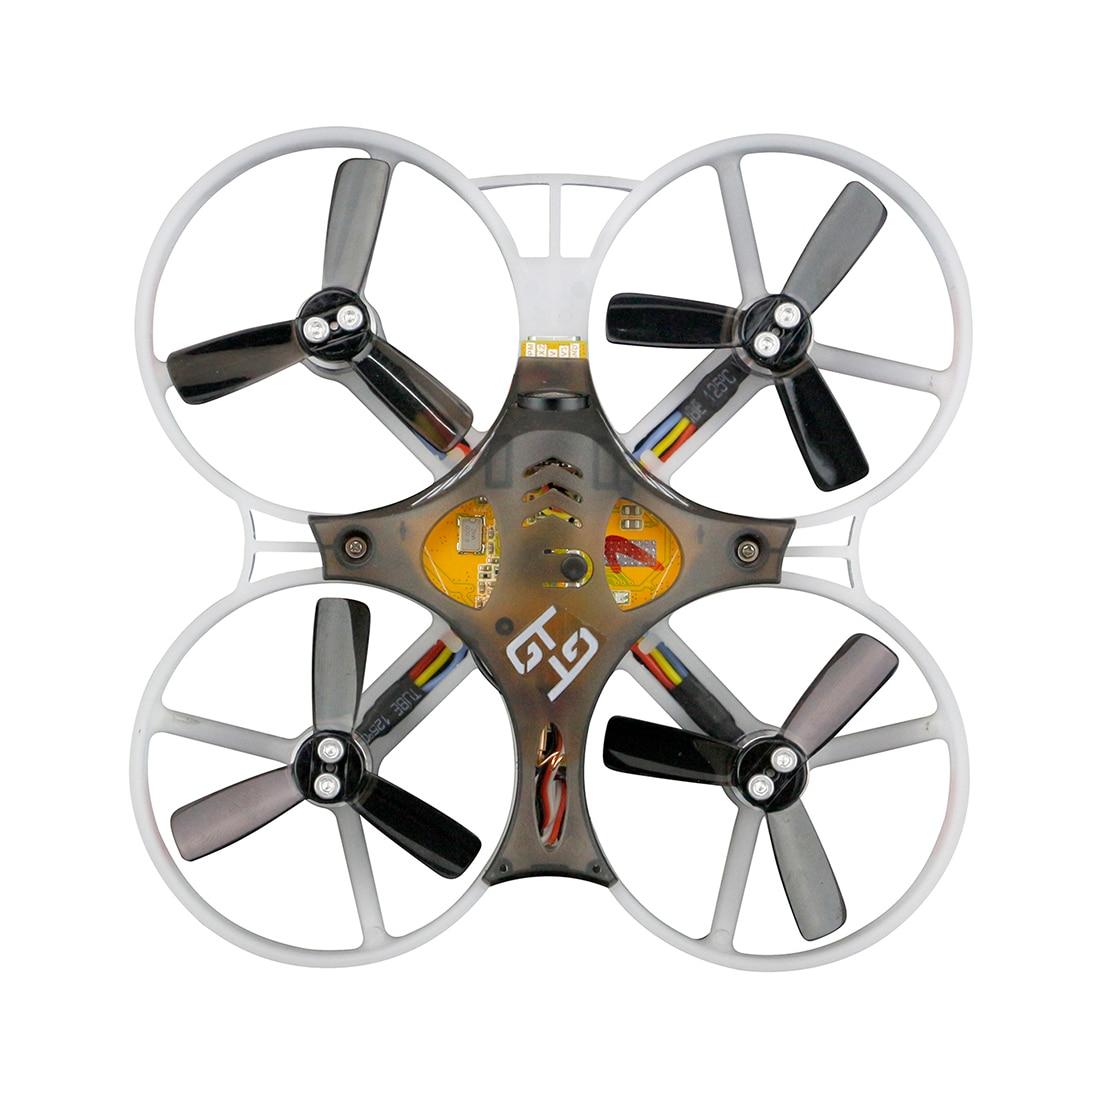 New LDARC 2S Power TINY GT7 75mm Wheelbase Ting Whoop Drone Mini Quadcopter Betaflight SPRACINGF3 10A BLHeli 800TVL Cam BNF man ting